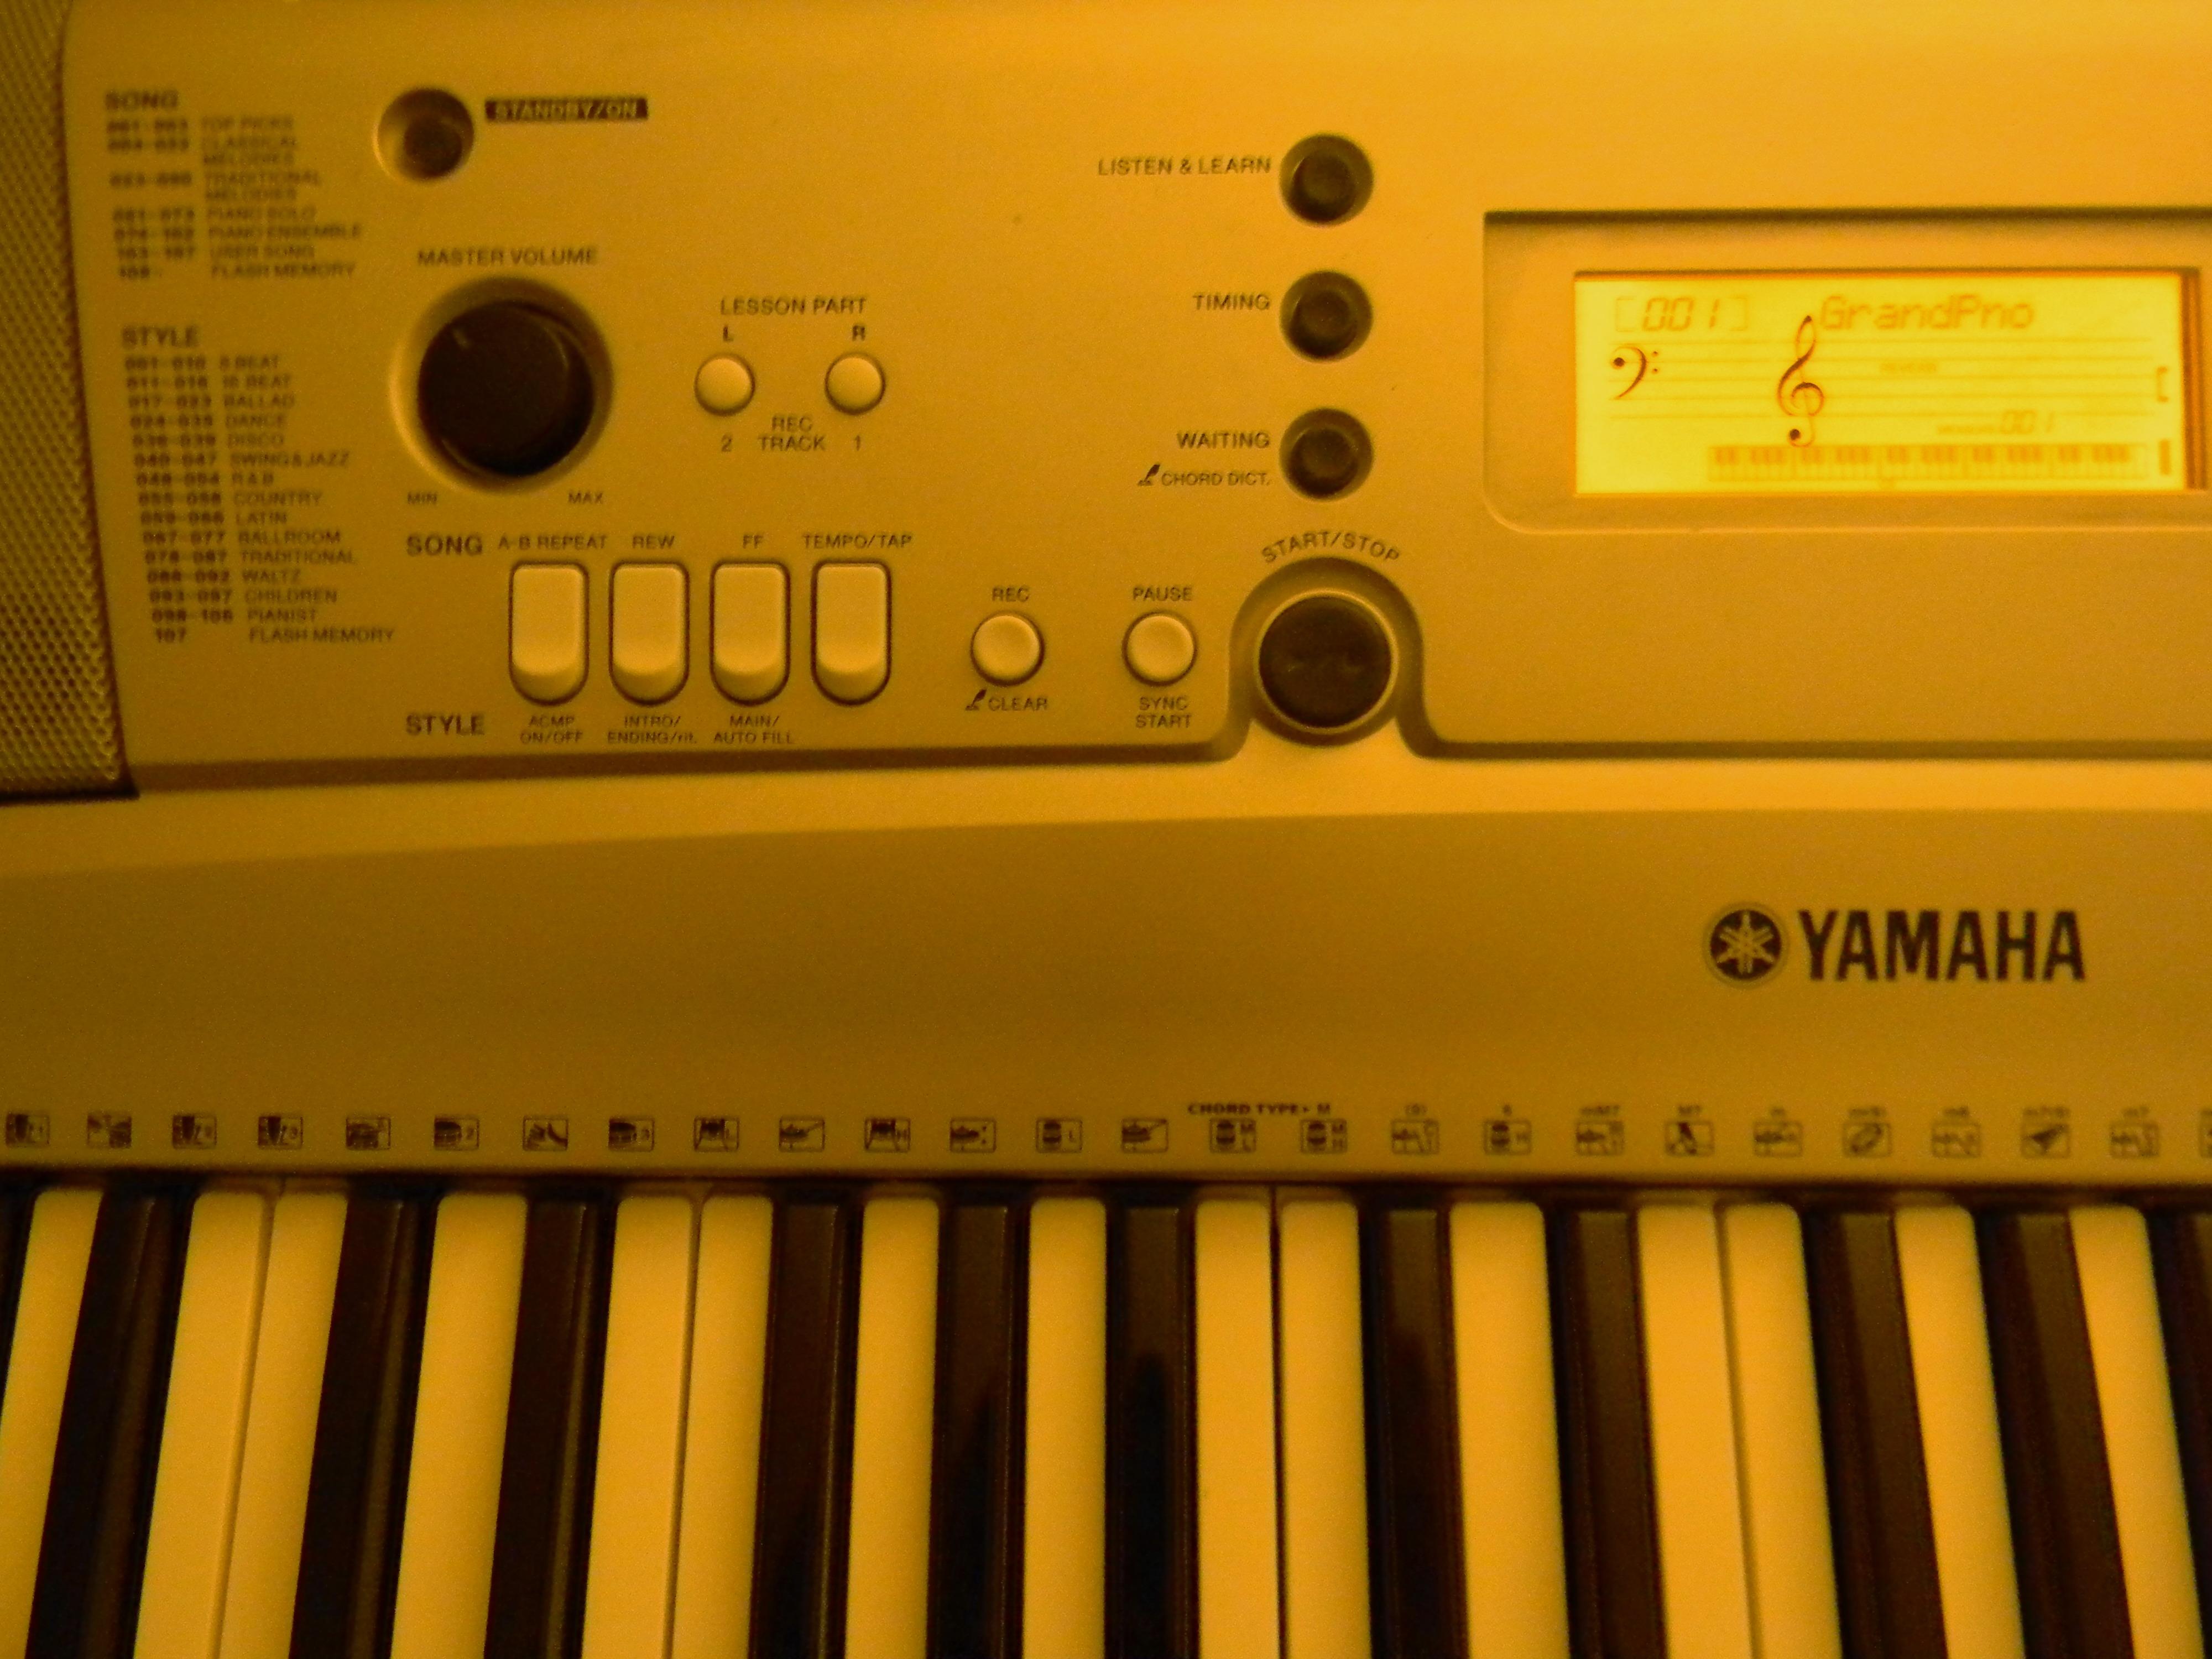 yamaha psr e303 manual sample user manual u2022 rh huelladakarbolivia com Bajo Yamaha Teclado Yamaha PSR S650